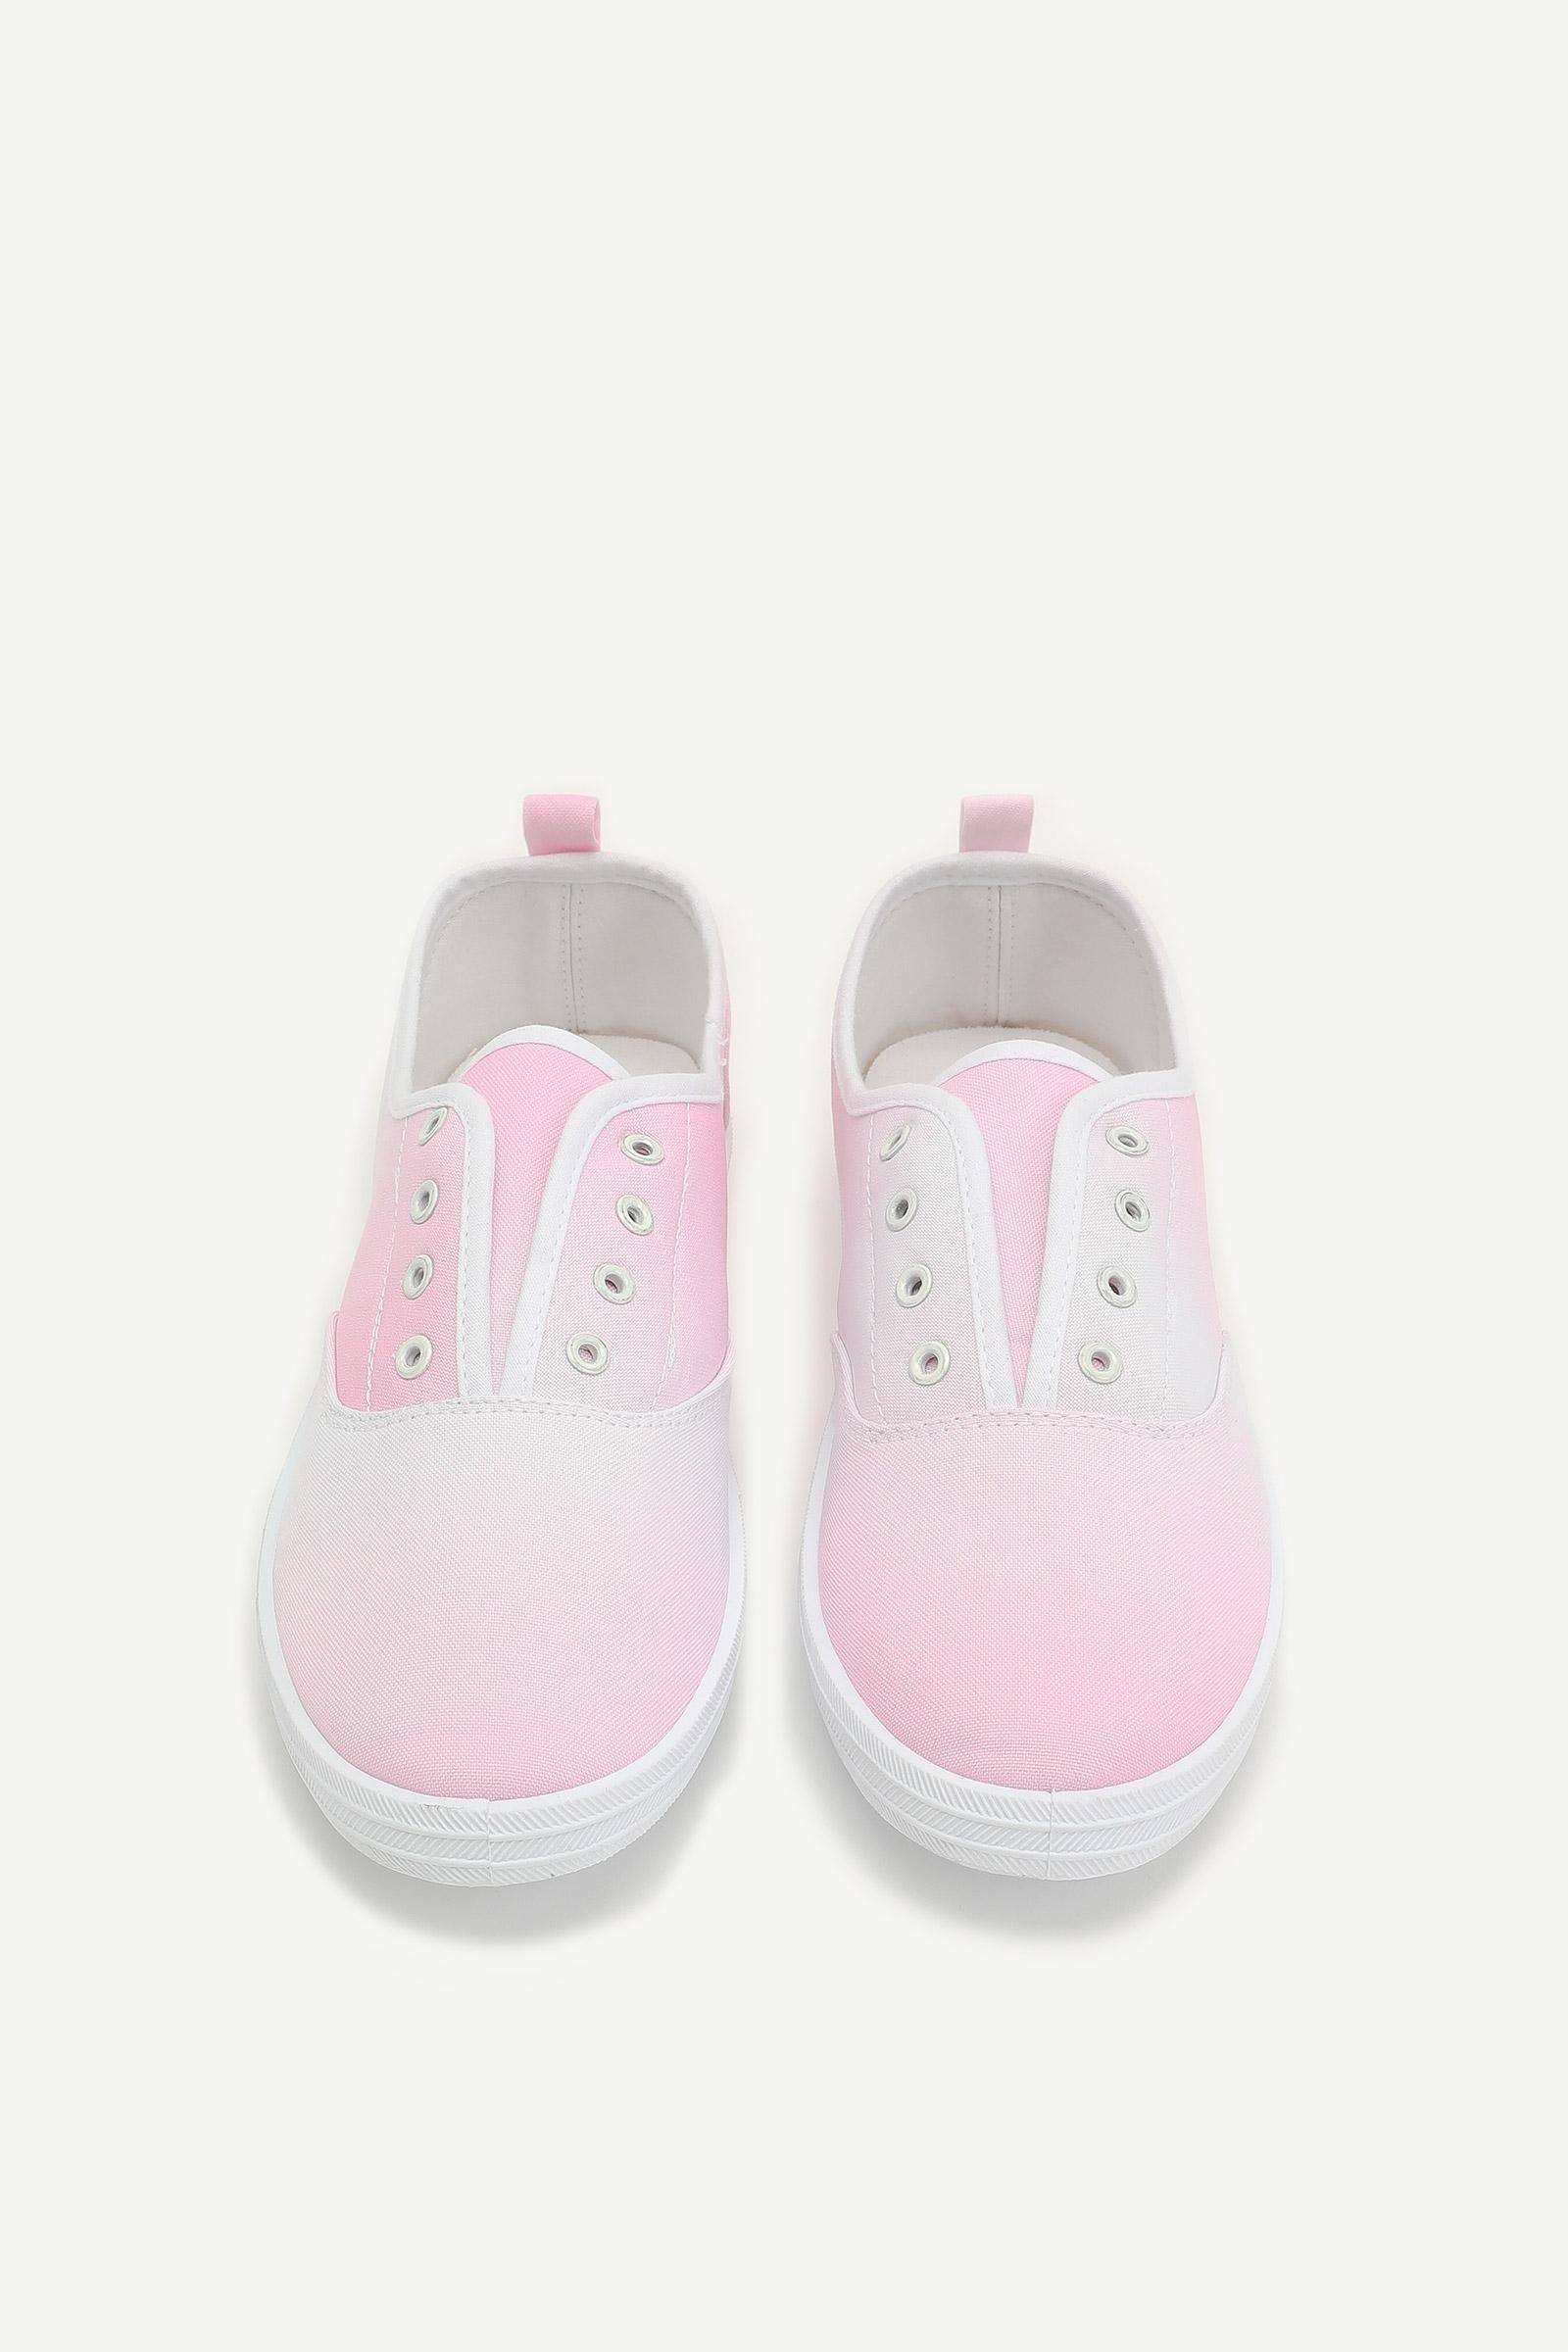 Tie-Dye Denim Sneakers